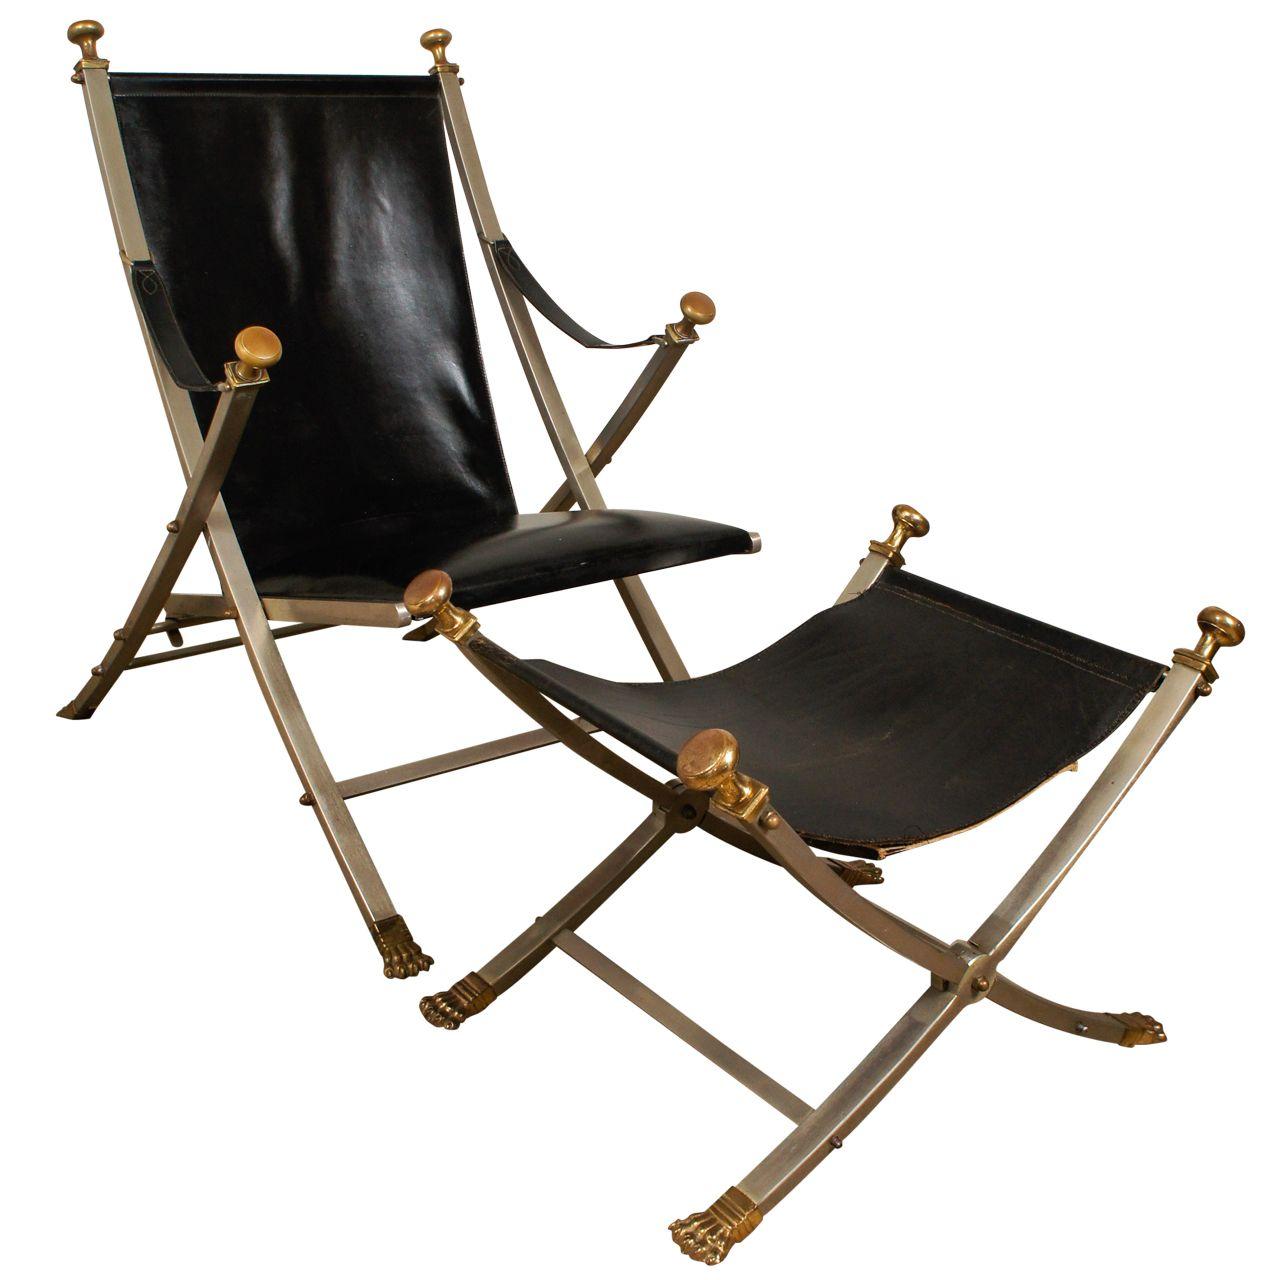 Maison Jansen Campaign Folding Chair And Ottoman Outside